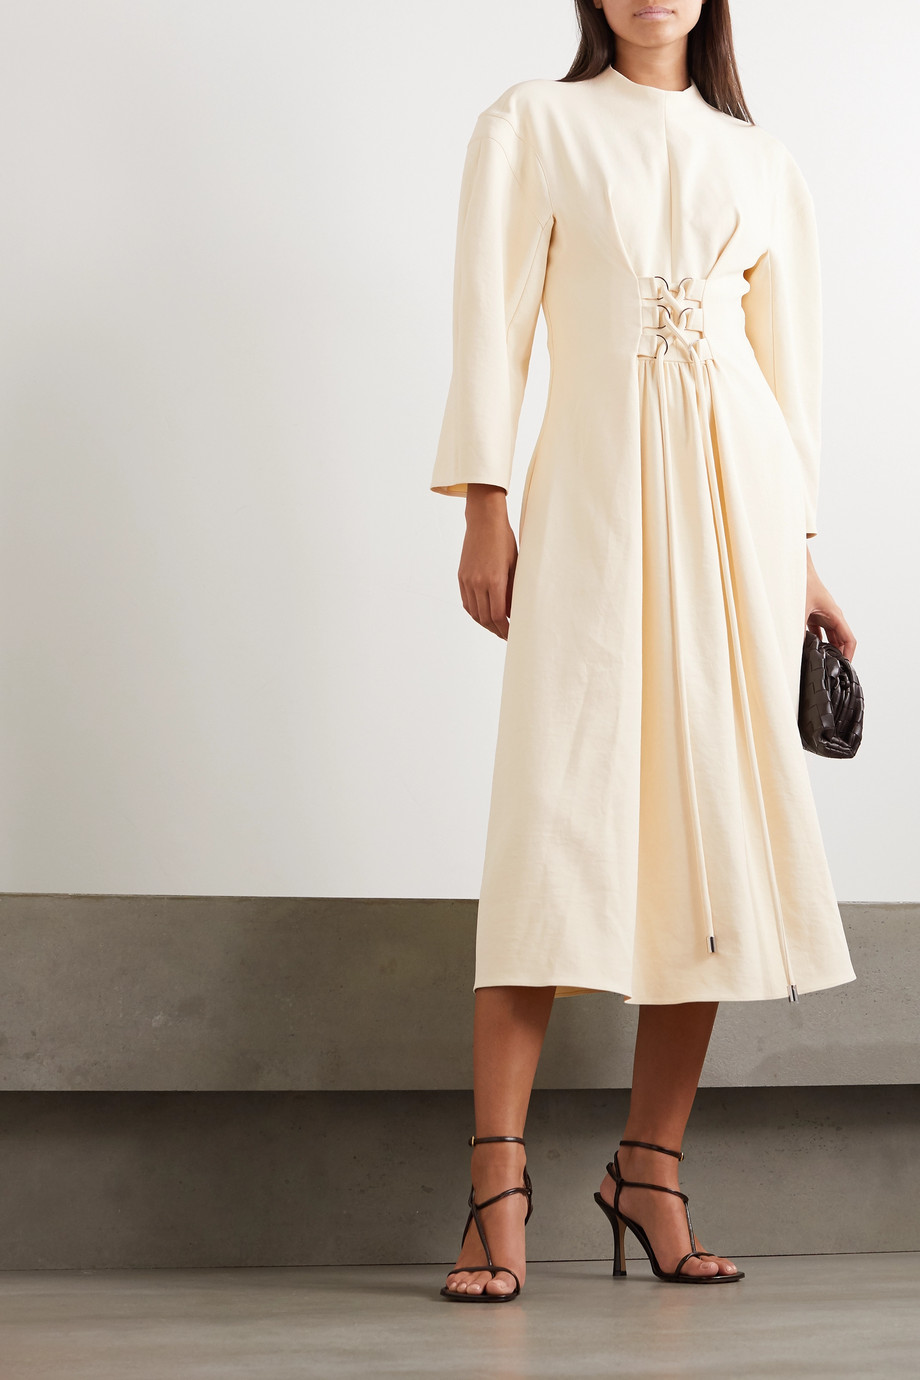 Tibi Chalky Drape lace-up grain de poudre midi dress